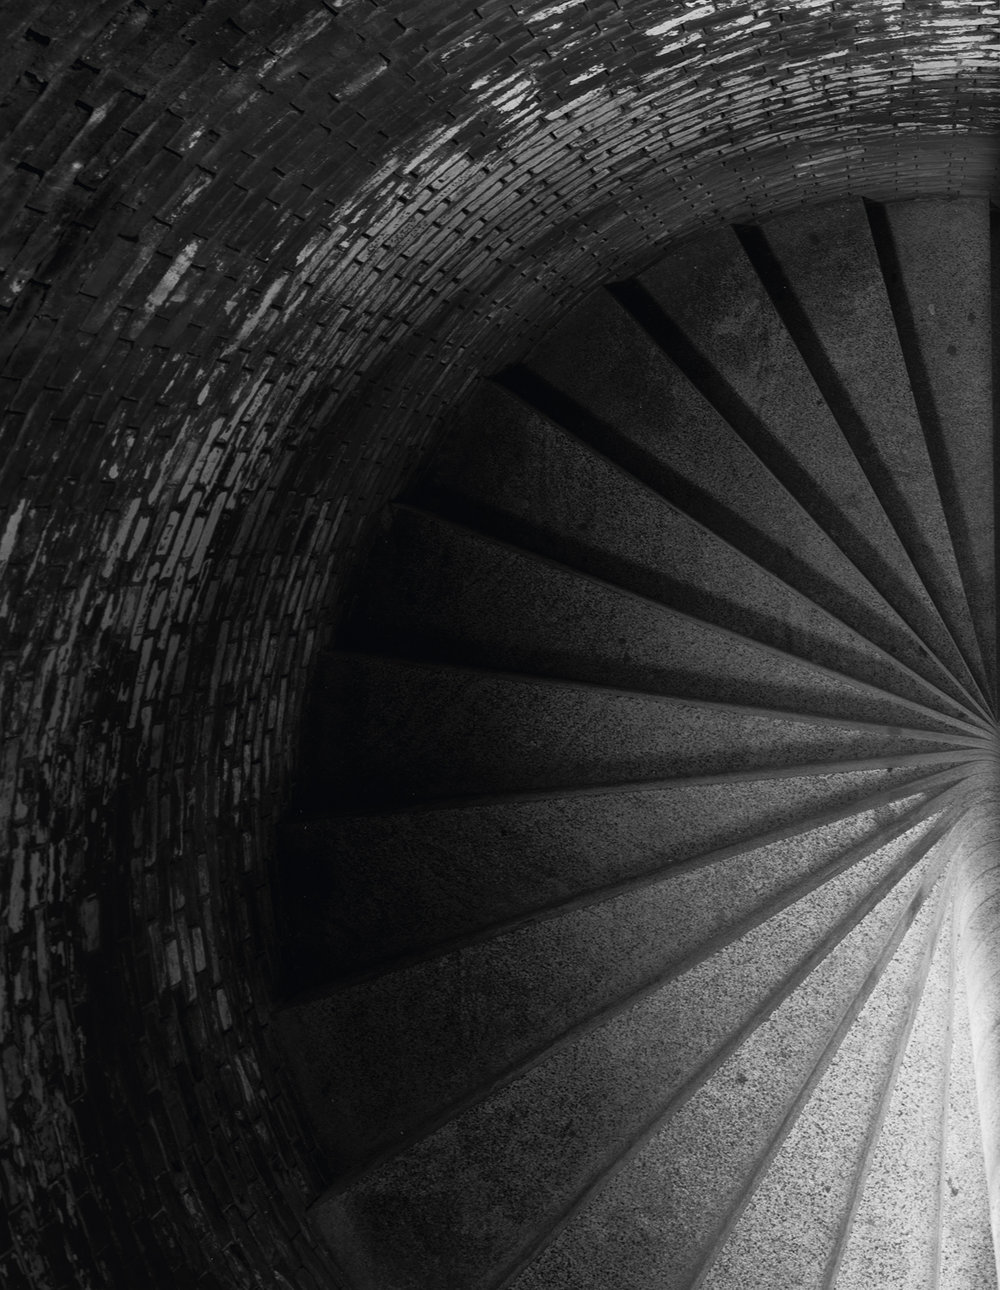 161027 Tower Stairs f32*5 min N+.5 8x6 Print File crop.jpg